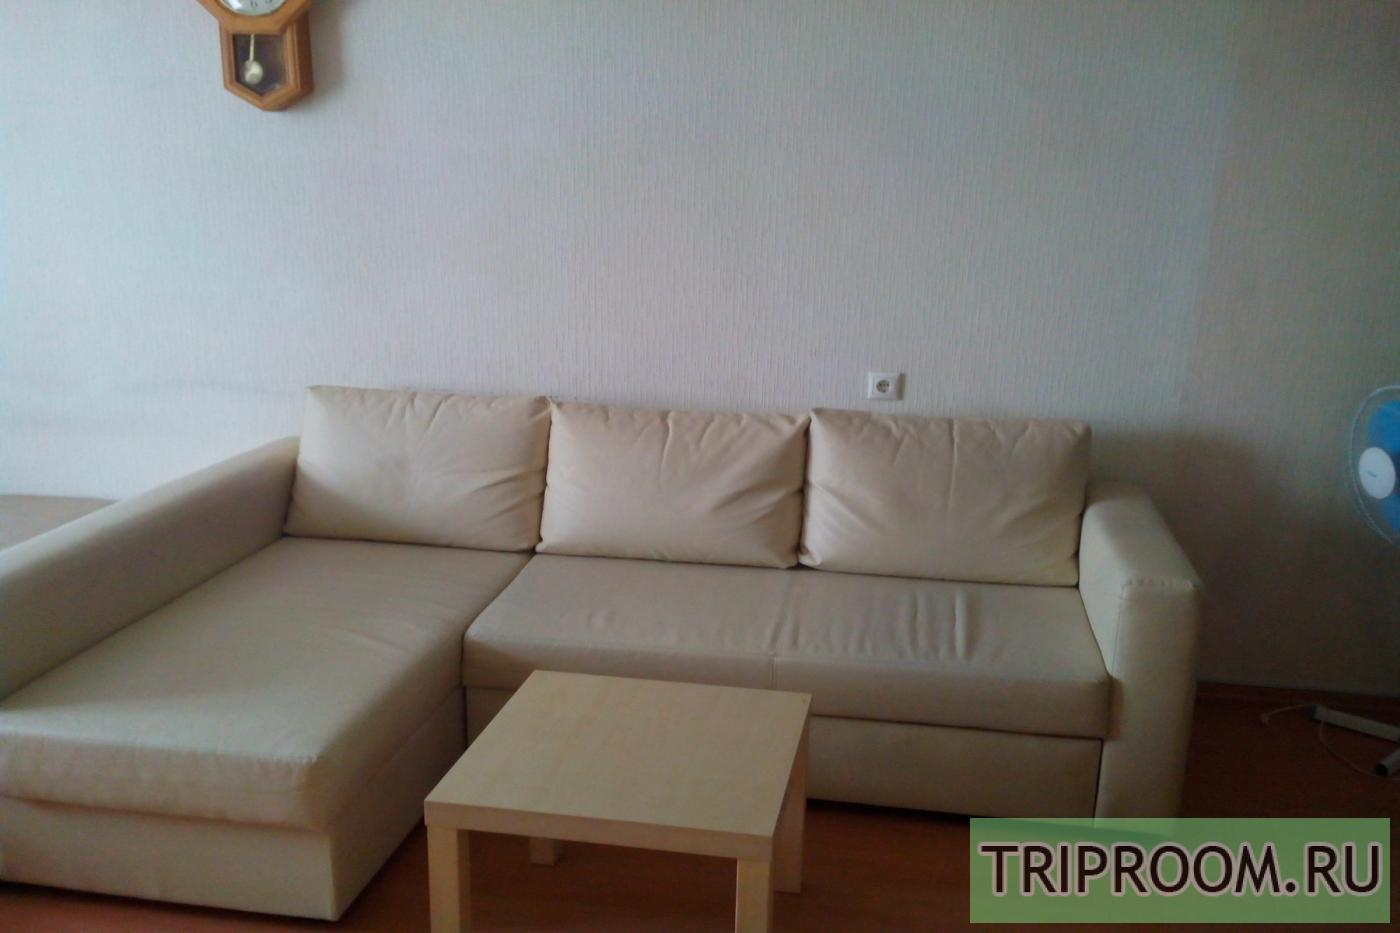 1-комнатная квартира посуточно (вариант № 10468), ул. Ломоносова улица, фото № 3